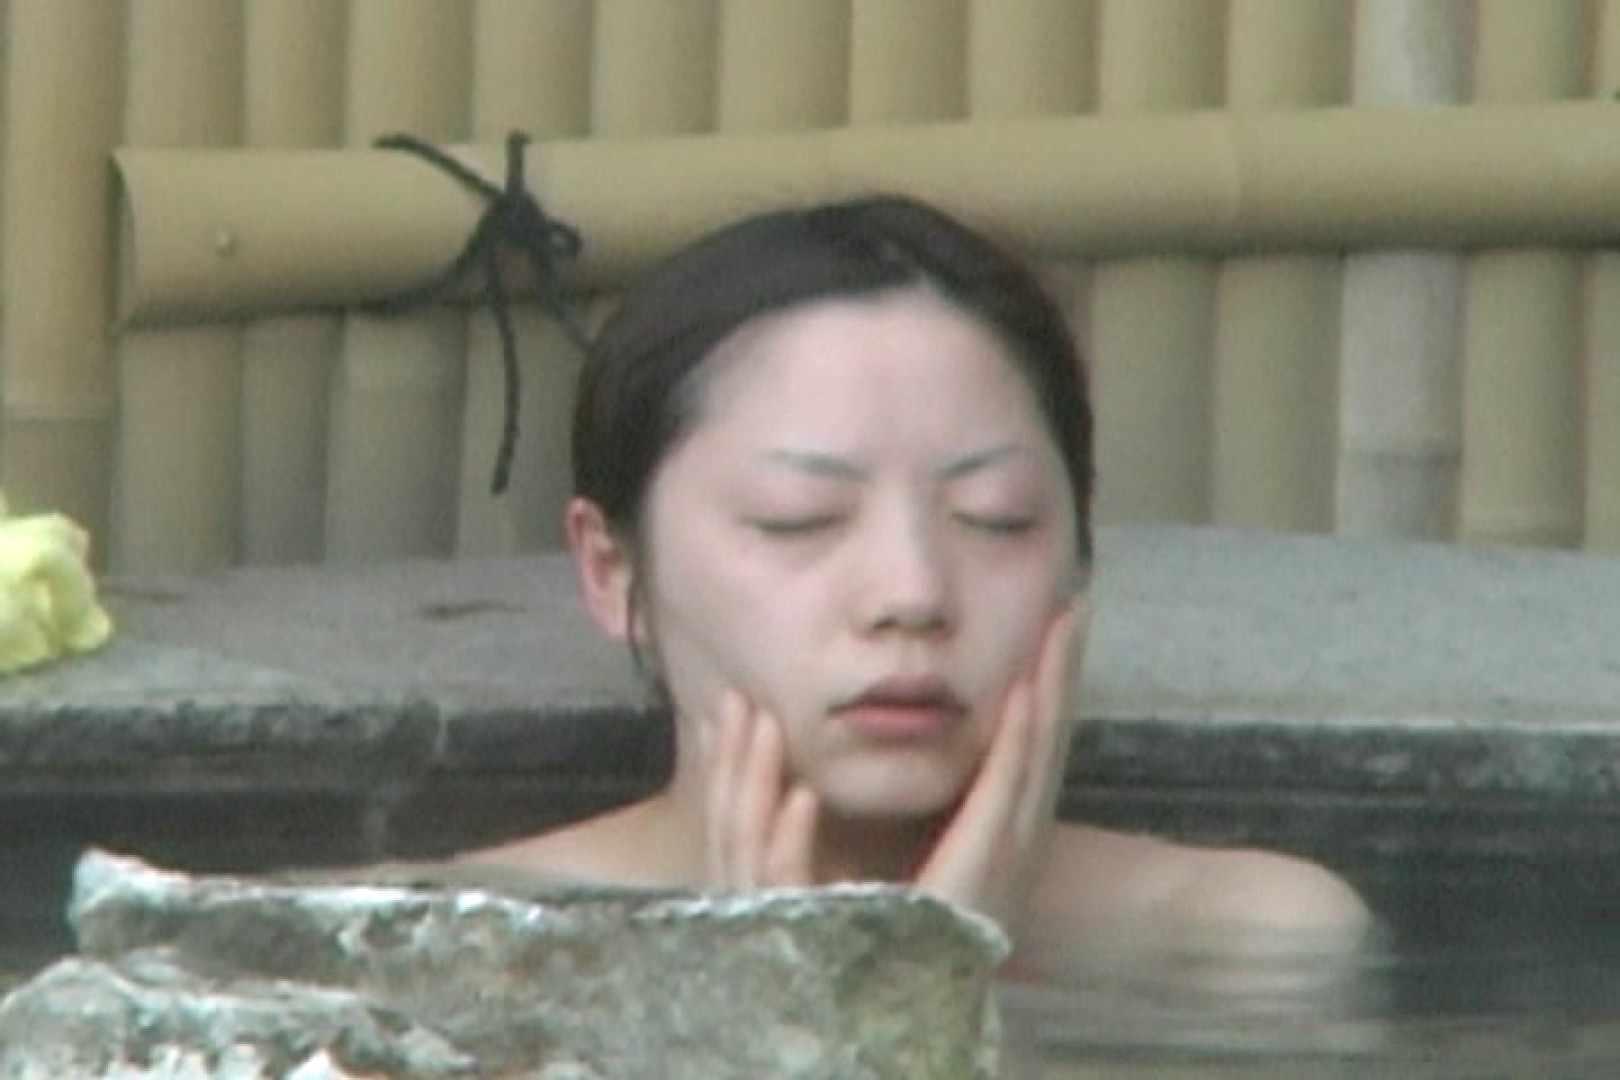 Aquaな露天風呂Vol.596 盗撮シリーズ | 露天風呂編  113PIX 103